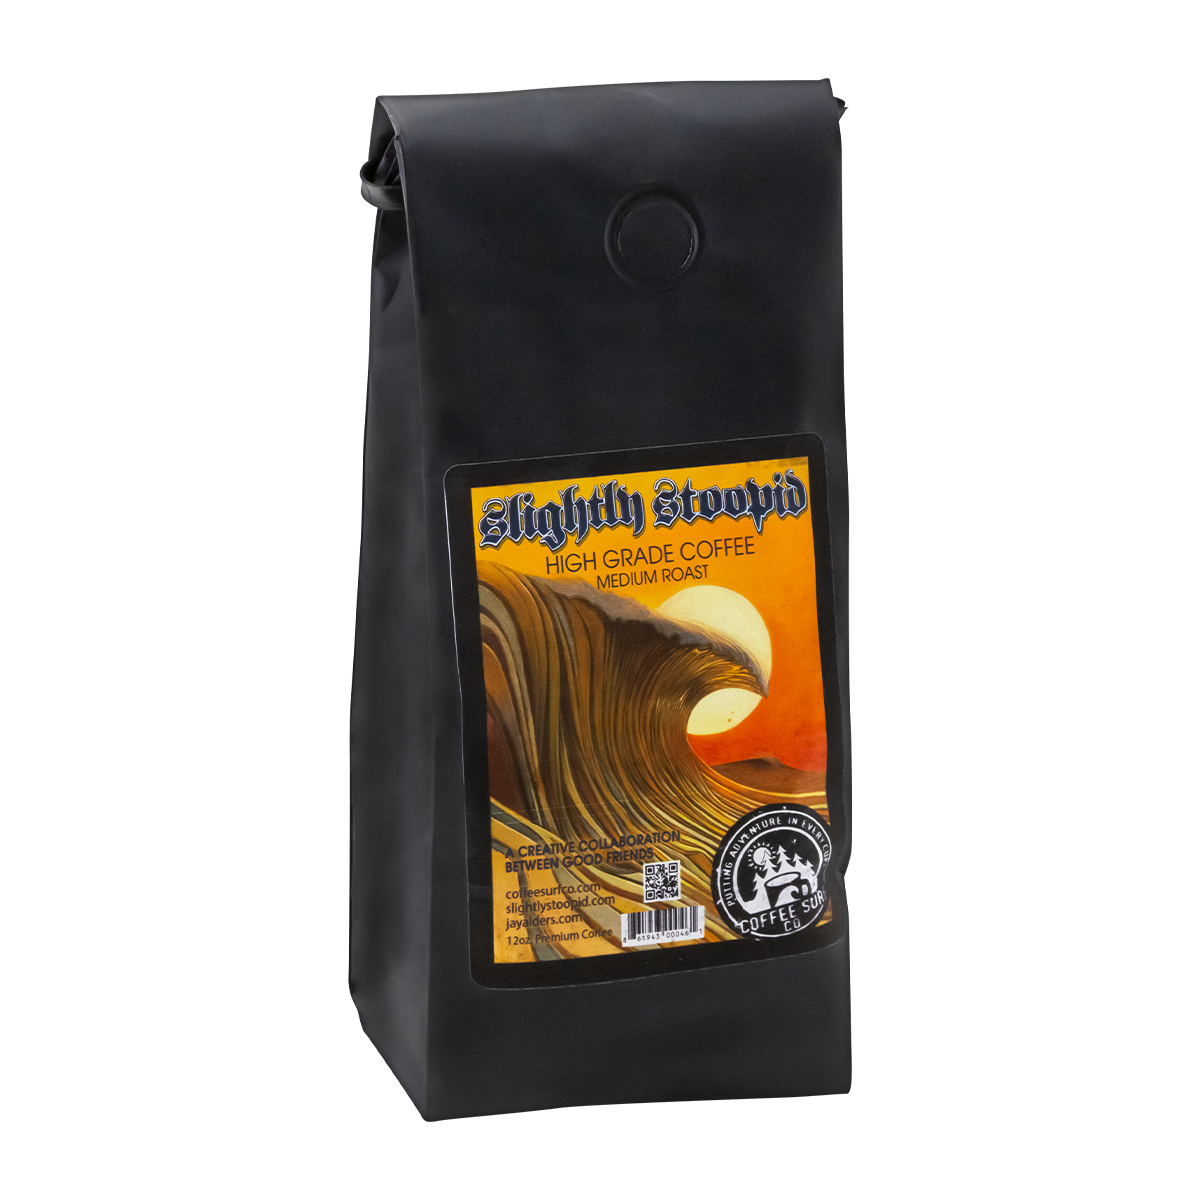 Slightly Stoopid x Coffee Surf Co. High Grade Coffee